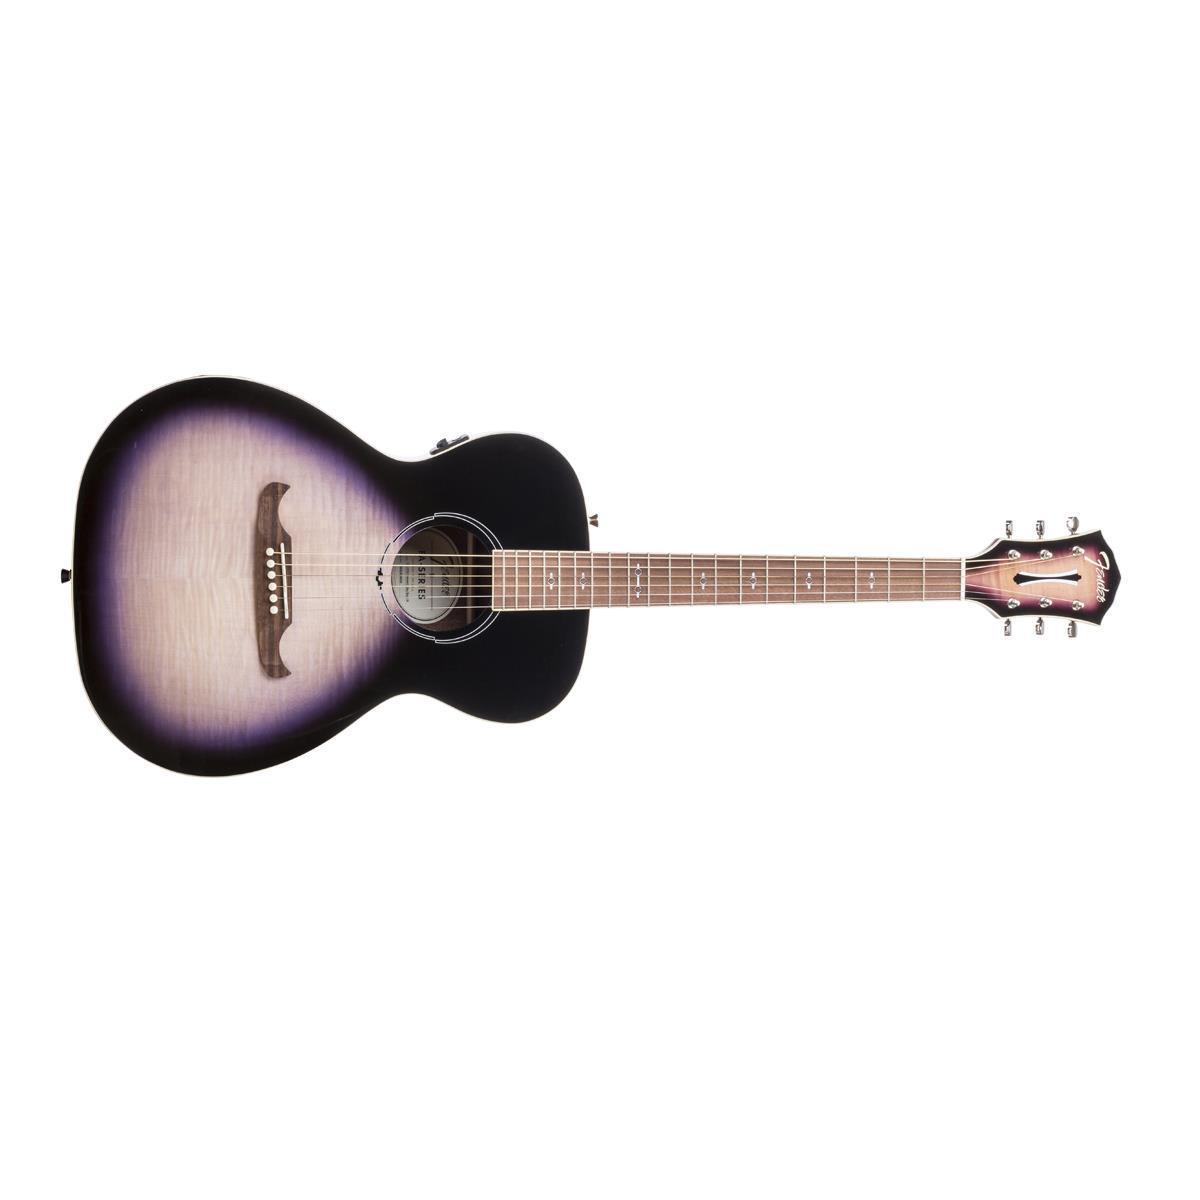 Fender FA-235E Concert Acoustic Electric Guitar $100 after $90 Slickdeals Rebate + free s/h